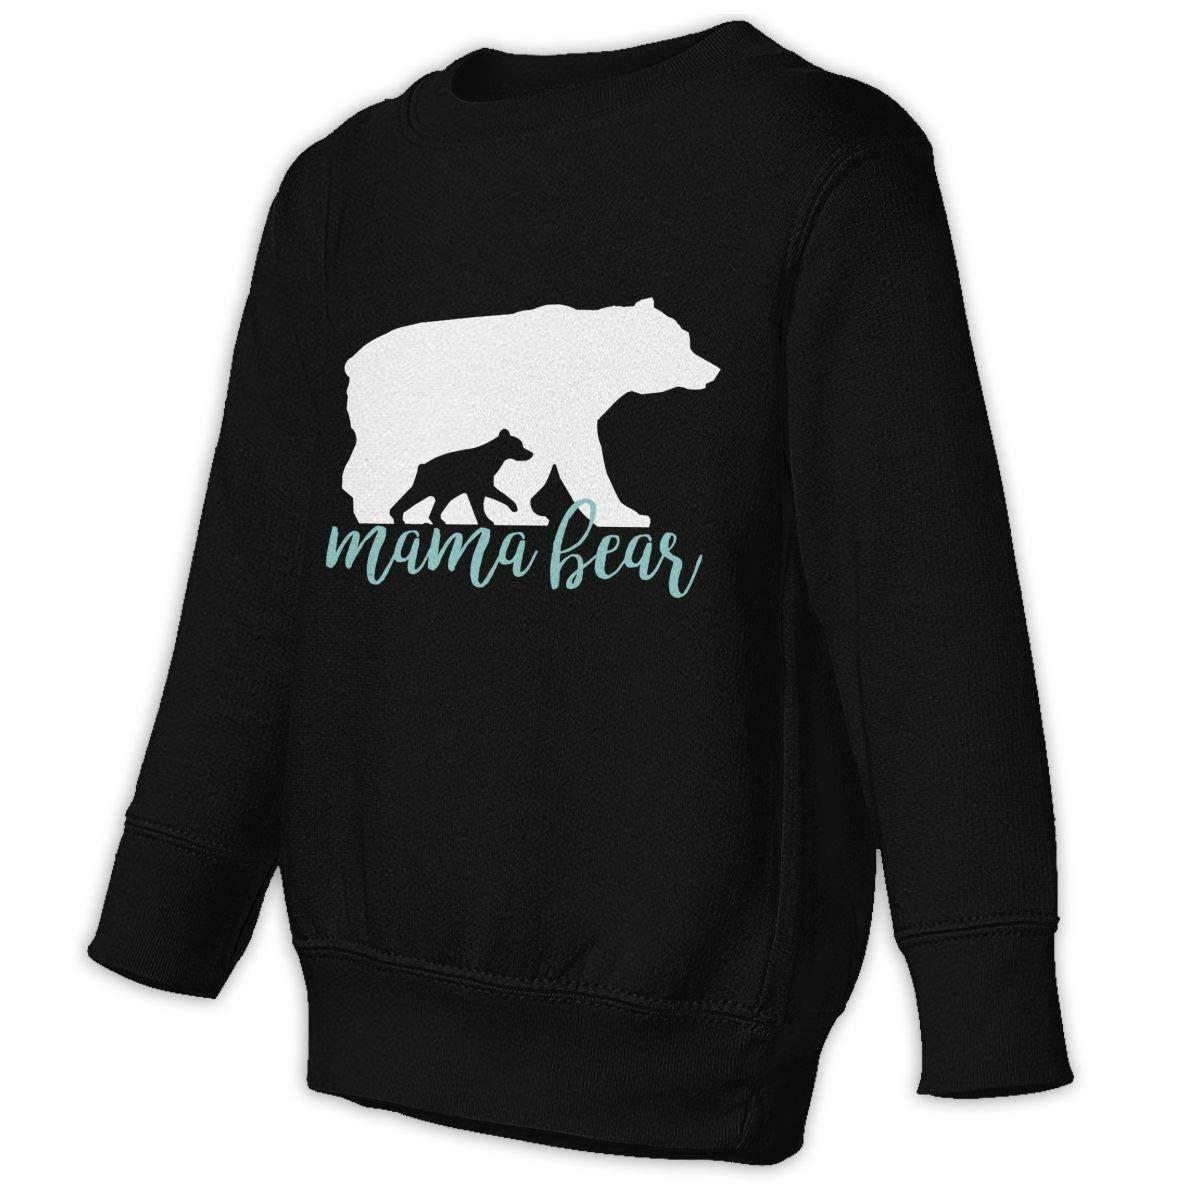 Mama Bear Kids Unisex Cotton Long Sleeve Round Neck Sweatshirt